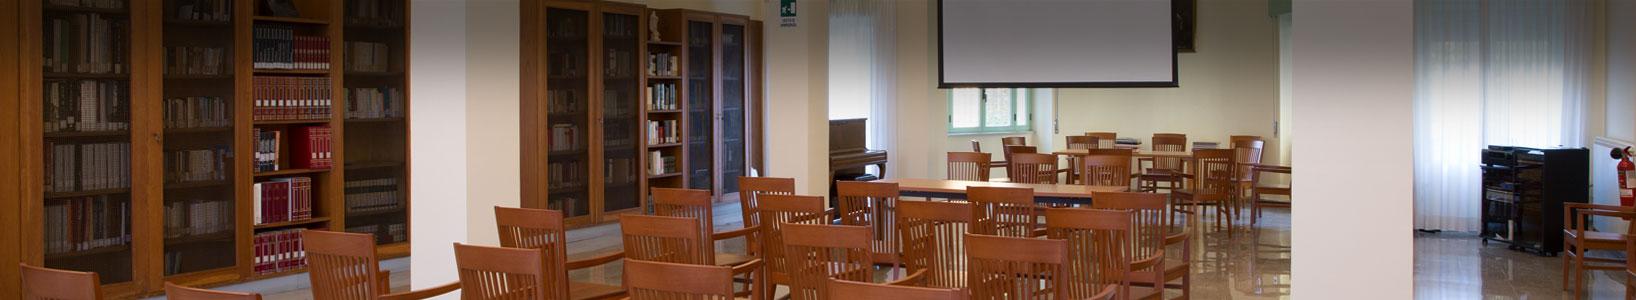 sala-conferenze-1